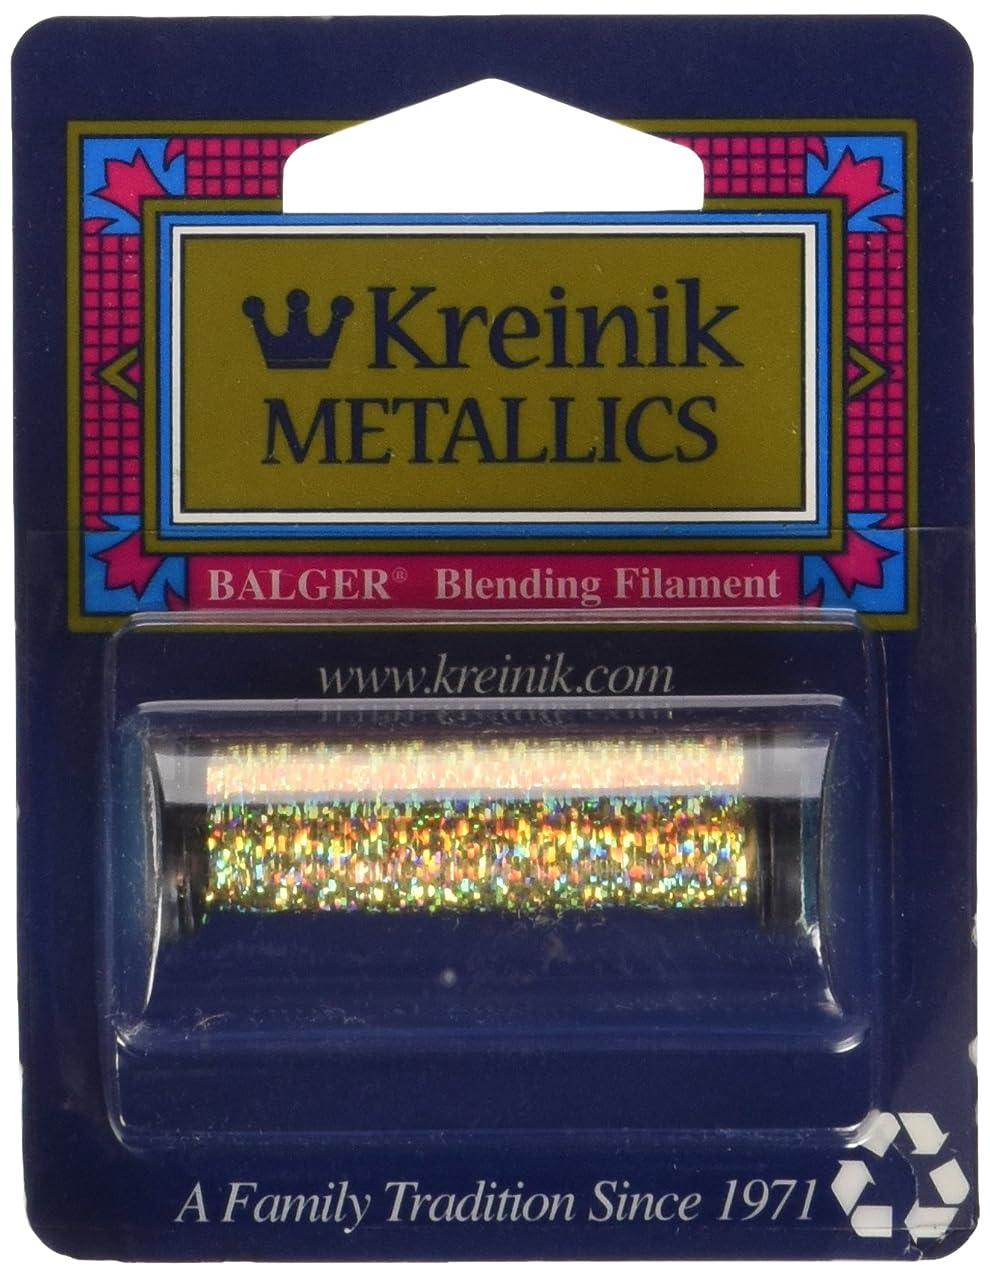 Kreinik Blending Filament 50m Metallic Thread for Sewing, 55-Yard, Chromo Gold